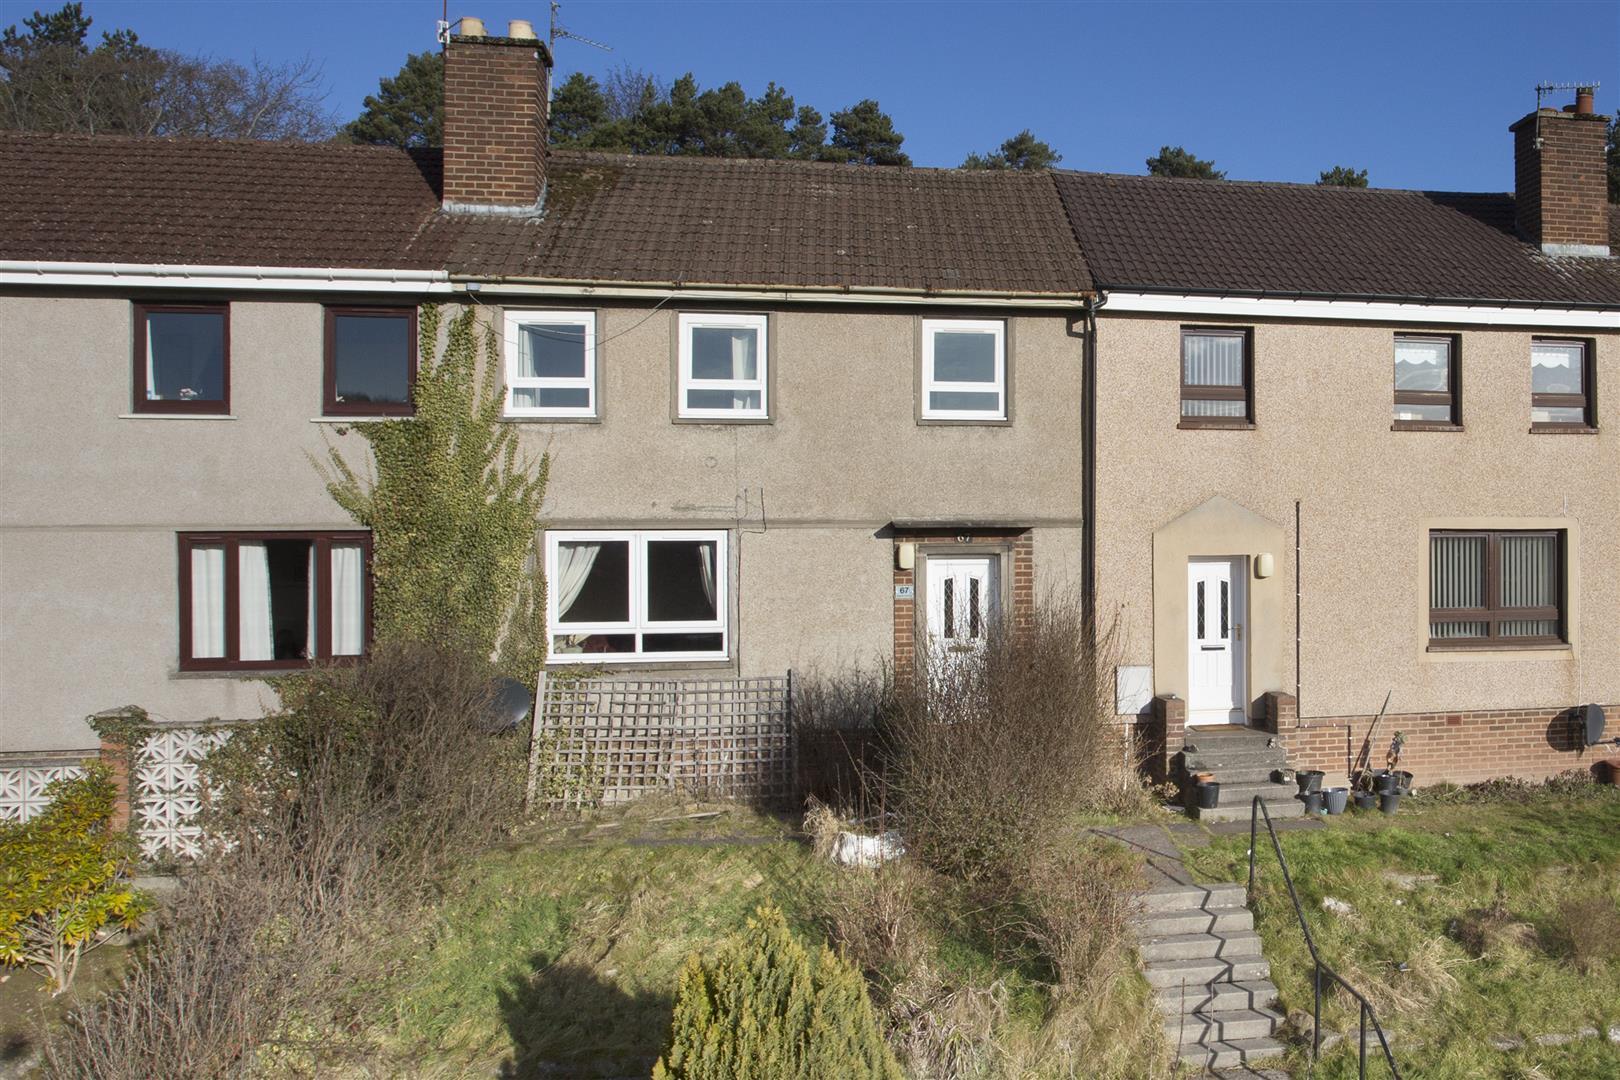 67, Brahan Terrace, Perth, Perthshire, PH1 2LN, UK